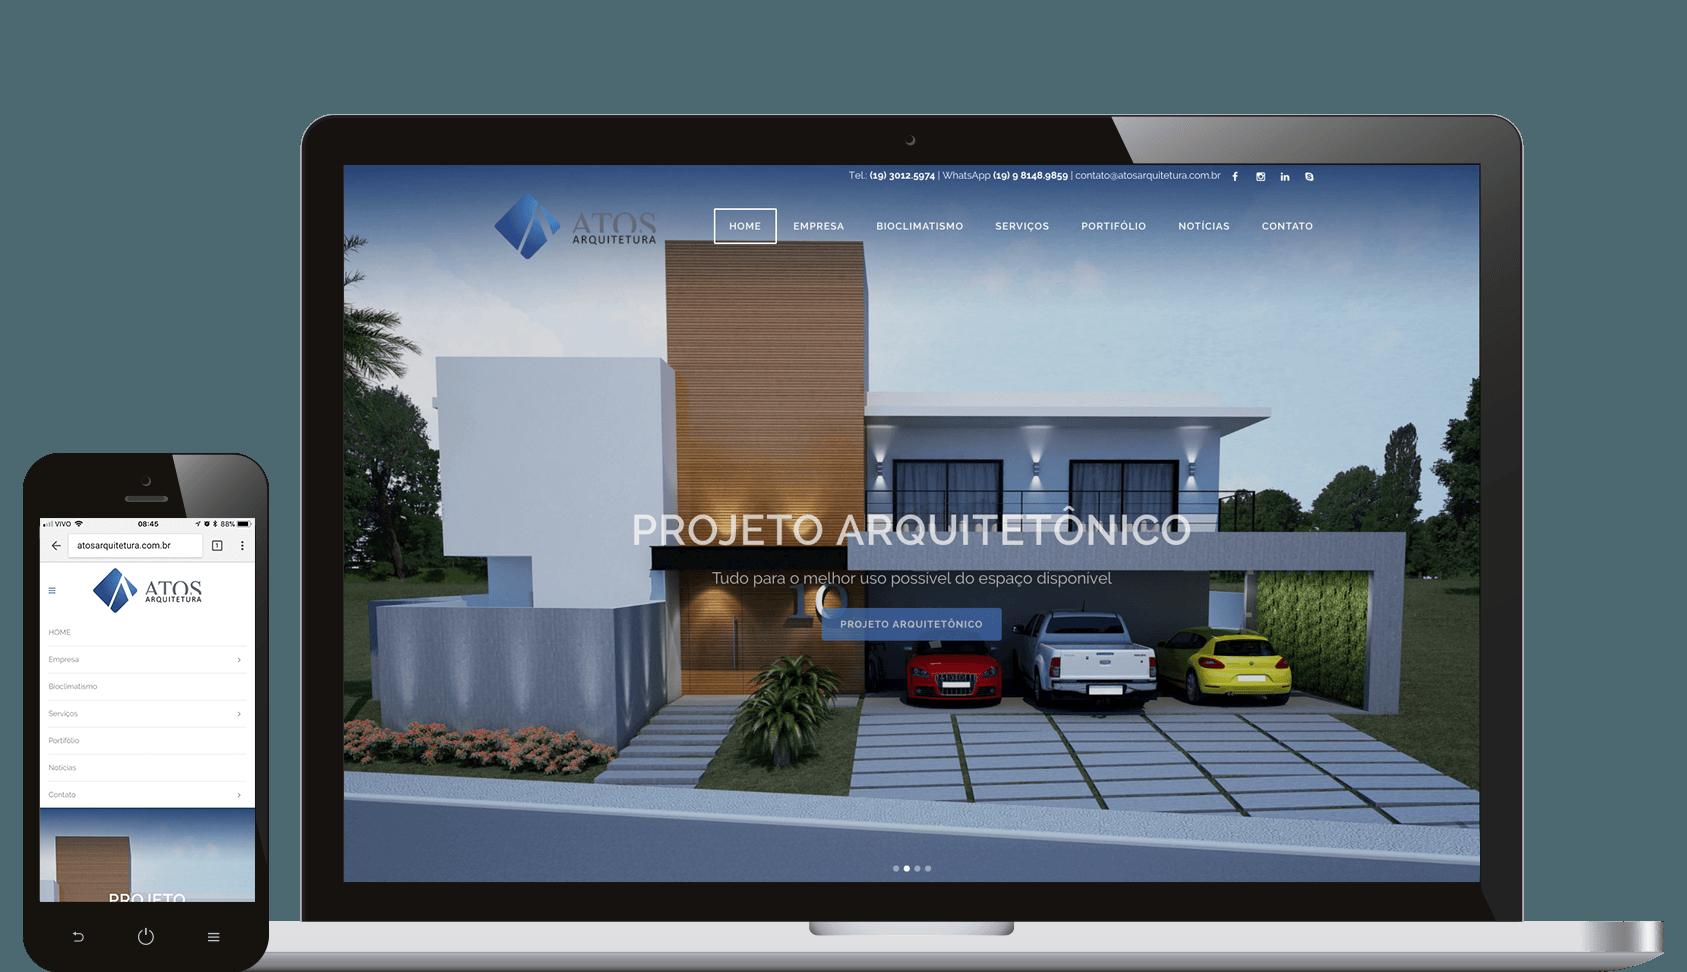 site scribd.com document digital marketing